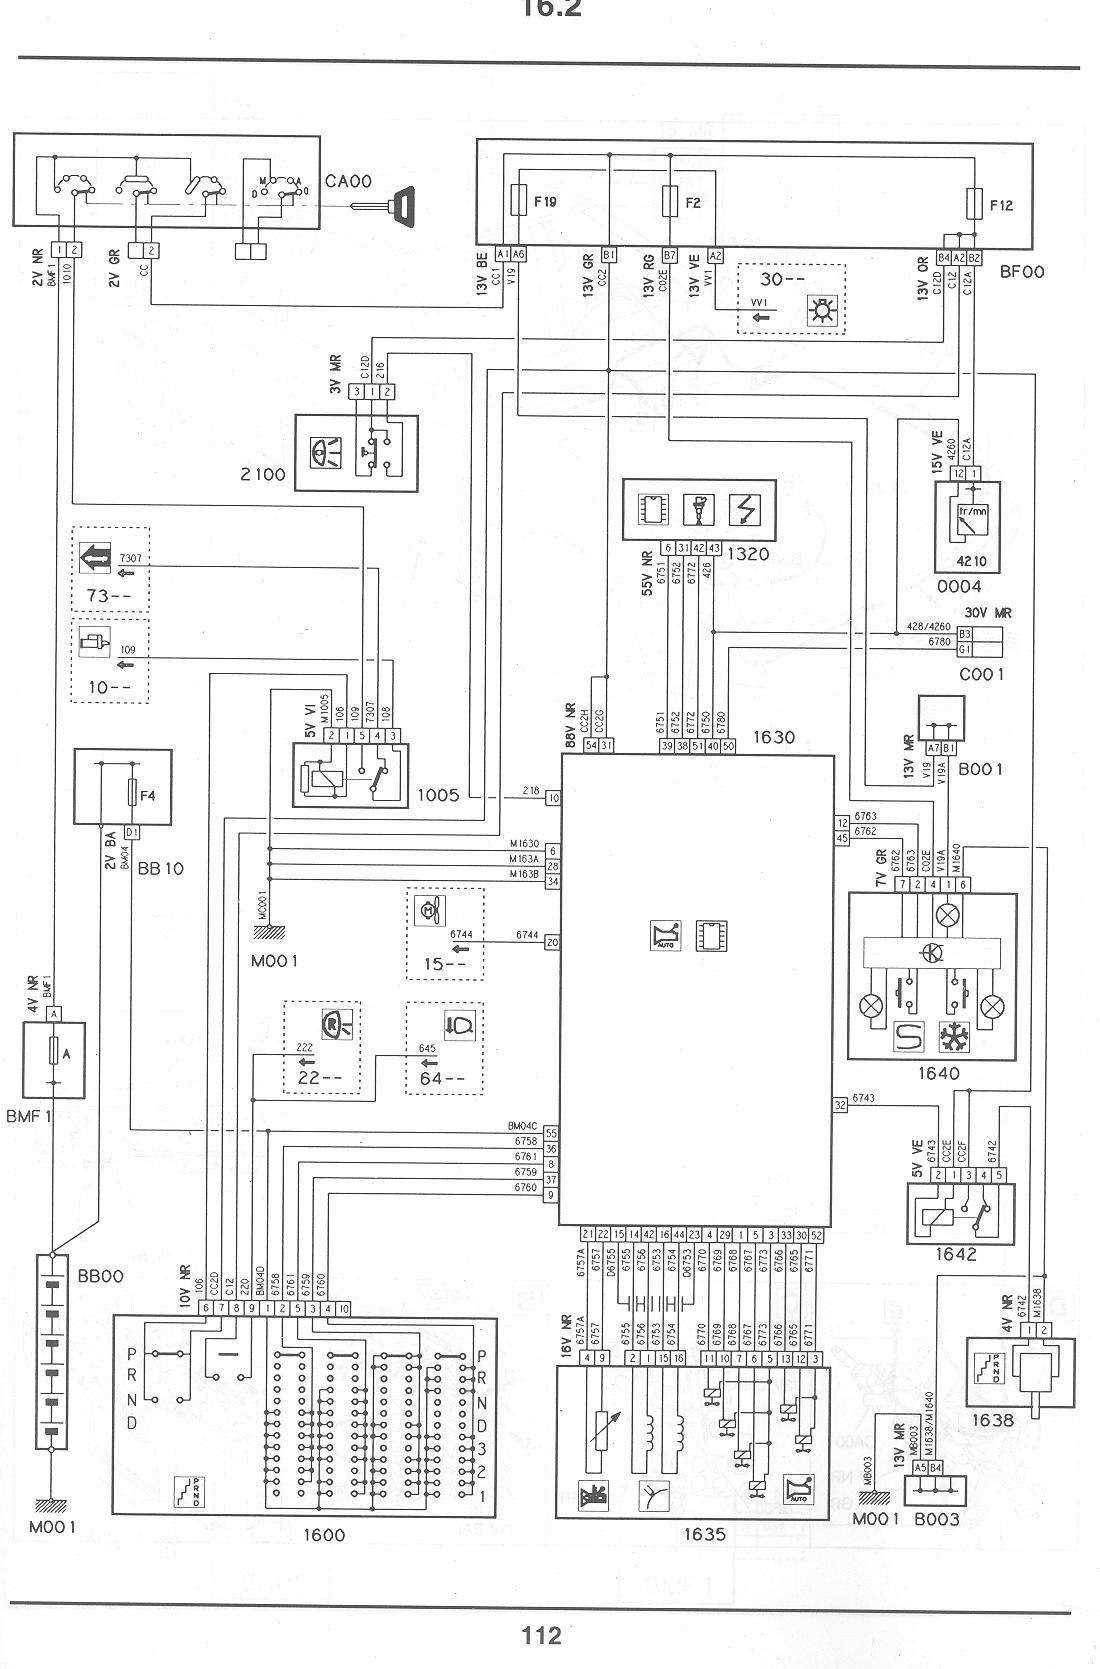 Terrific Citroen Xantia Hdi Wiring Diagram Basic Electronics Wiring Diagram Wiring Cloud Monangrecoveryedborg